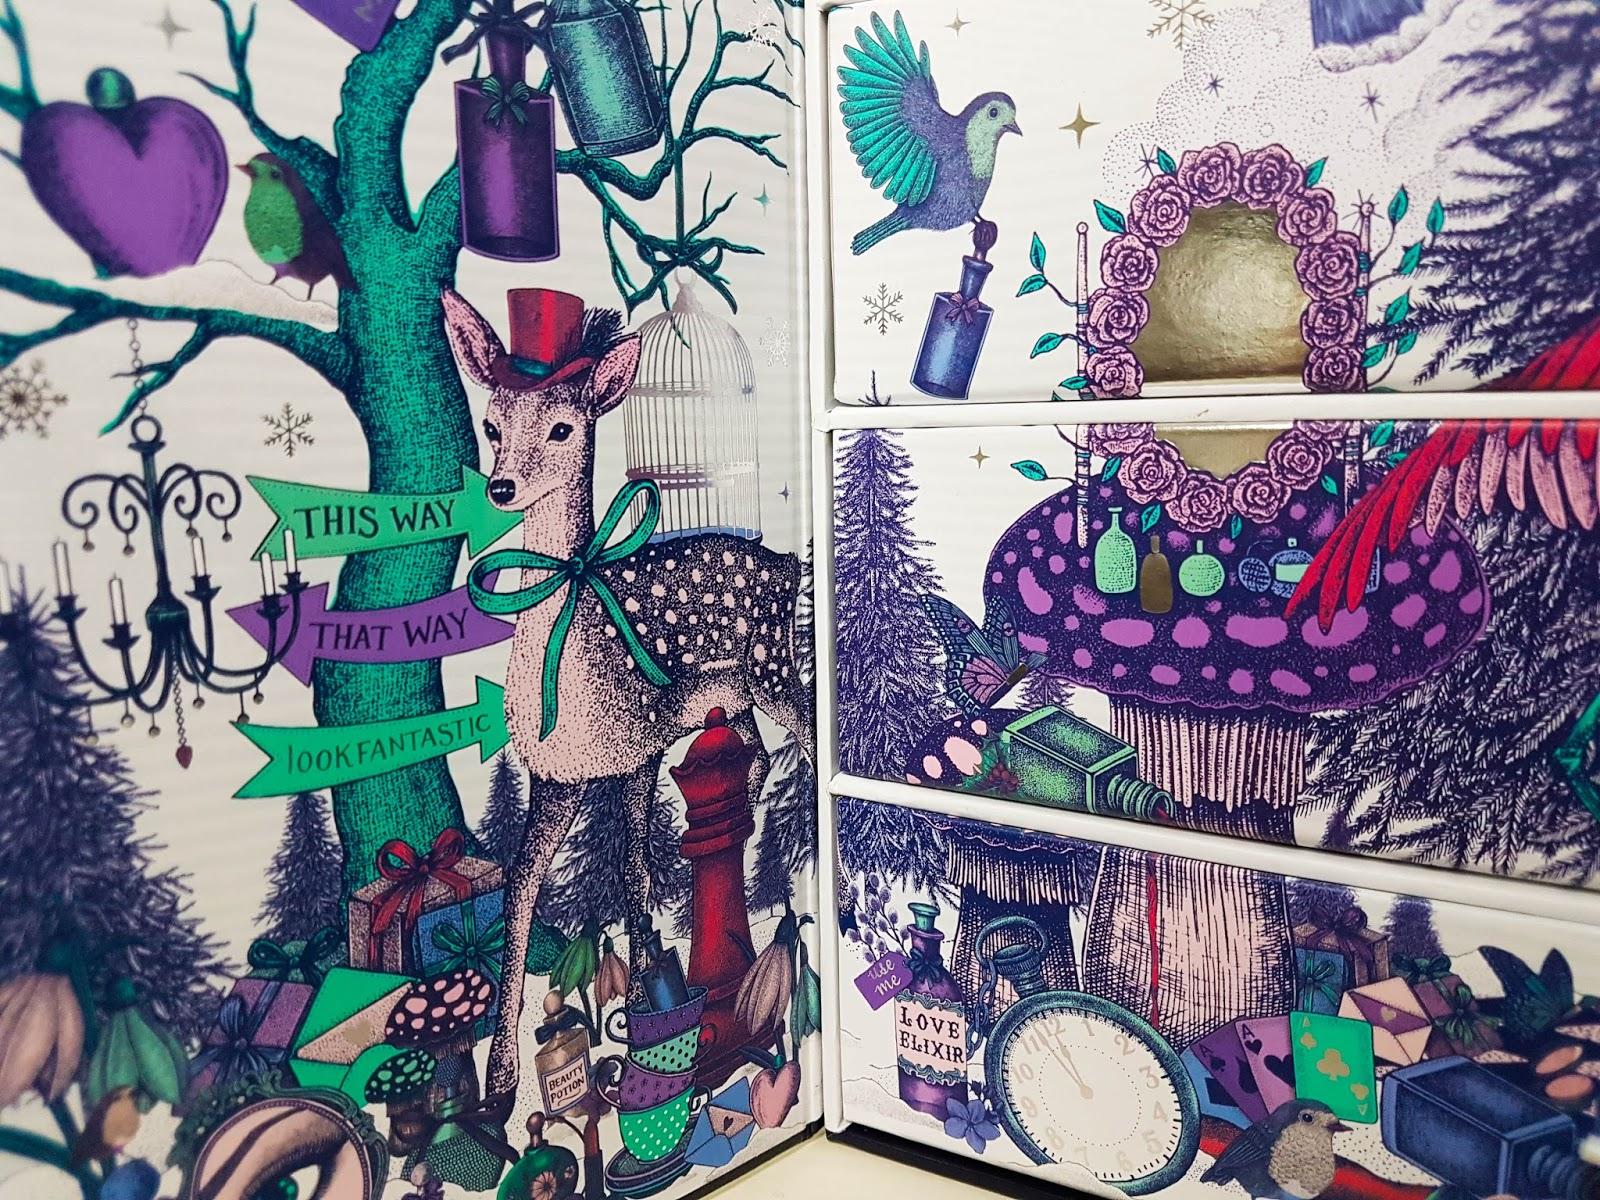 avis_calendrier_de_l_avent_look_fantastic_2017_beauty_in_wonderland_code_promo_mama_syca_beaute